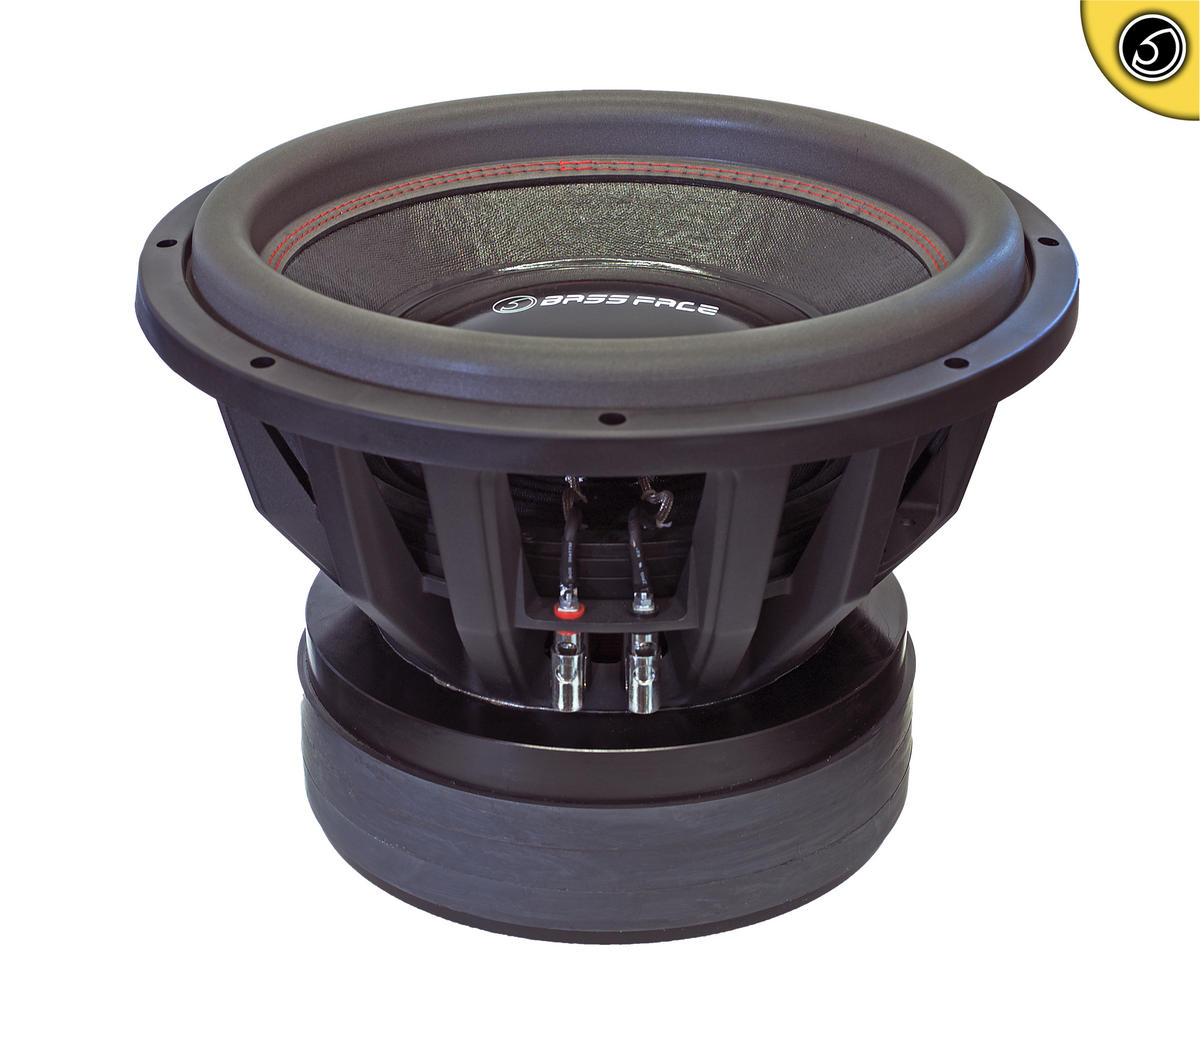 "Bassface XPL15.1SPL 15"" Inch 38cm 10000w Subwoofer 0.7x0.7Ohm Extreme Sub Woofer"